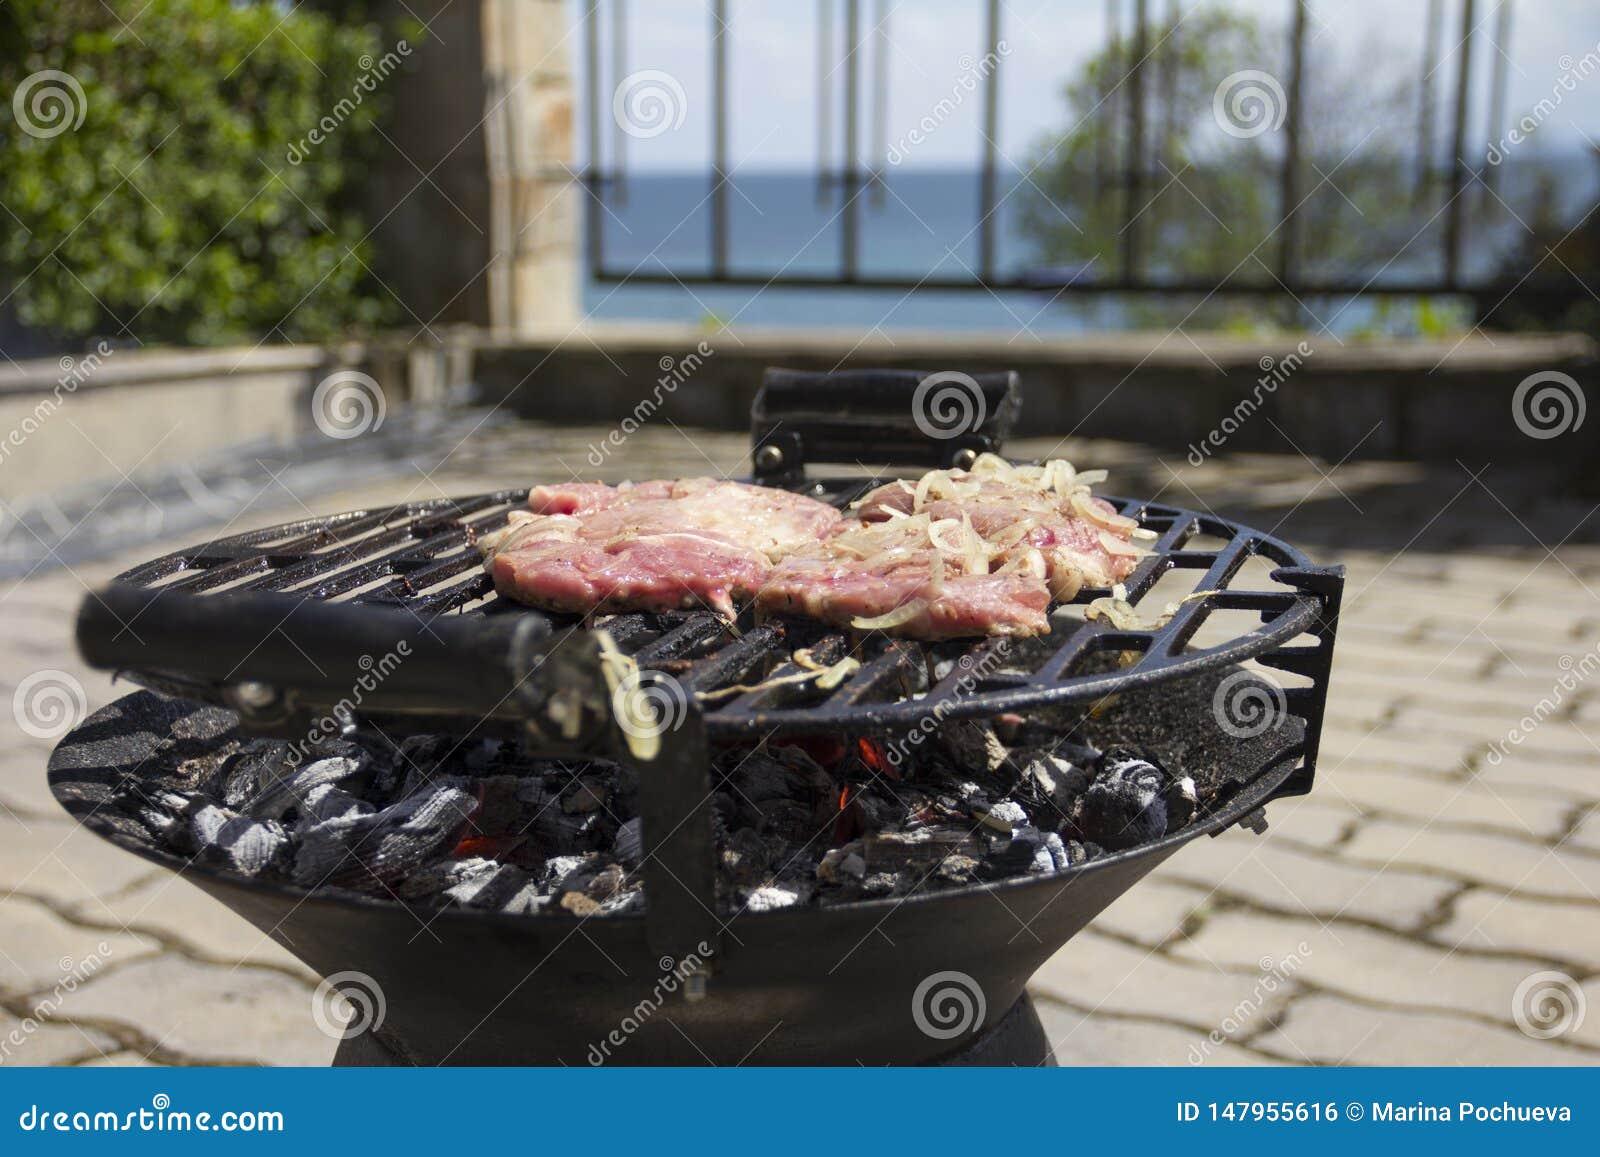 La carne fresca ? arrostita su un barbecue con le cipolle